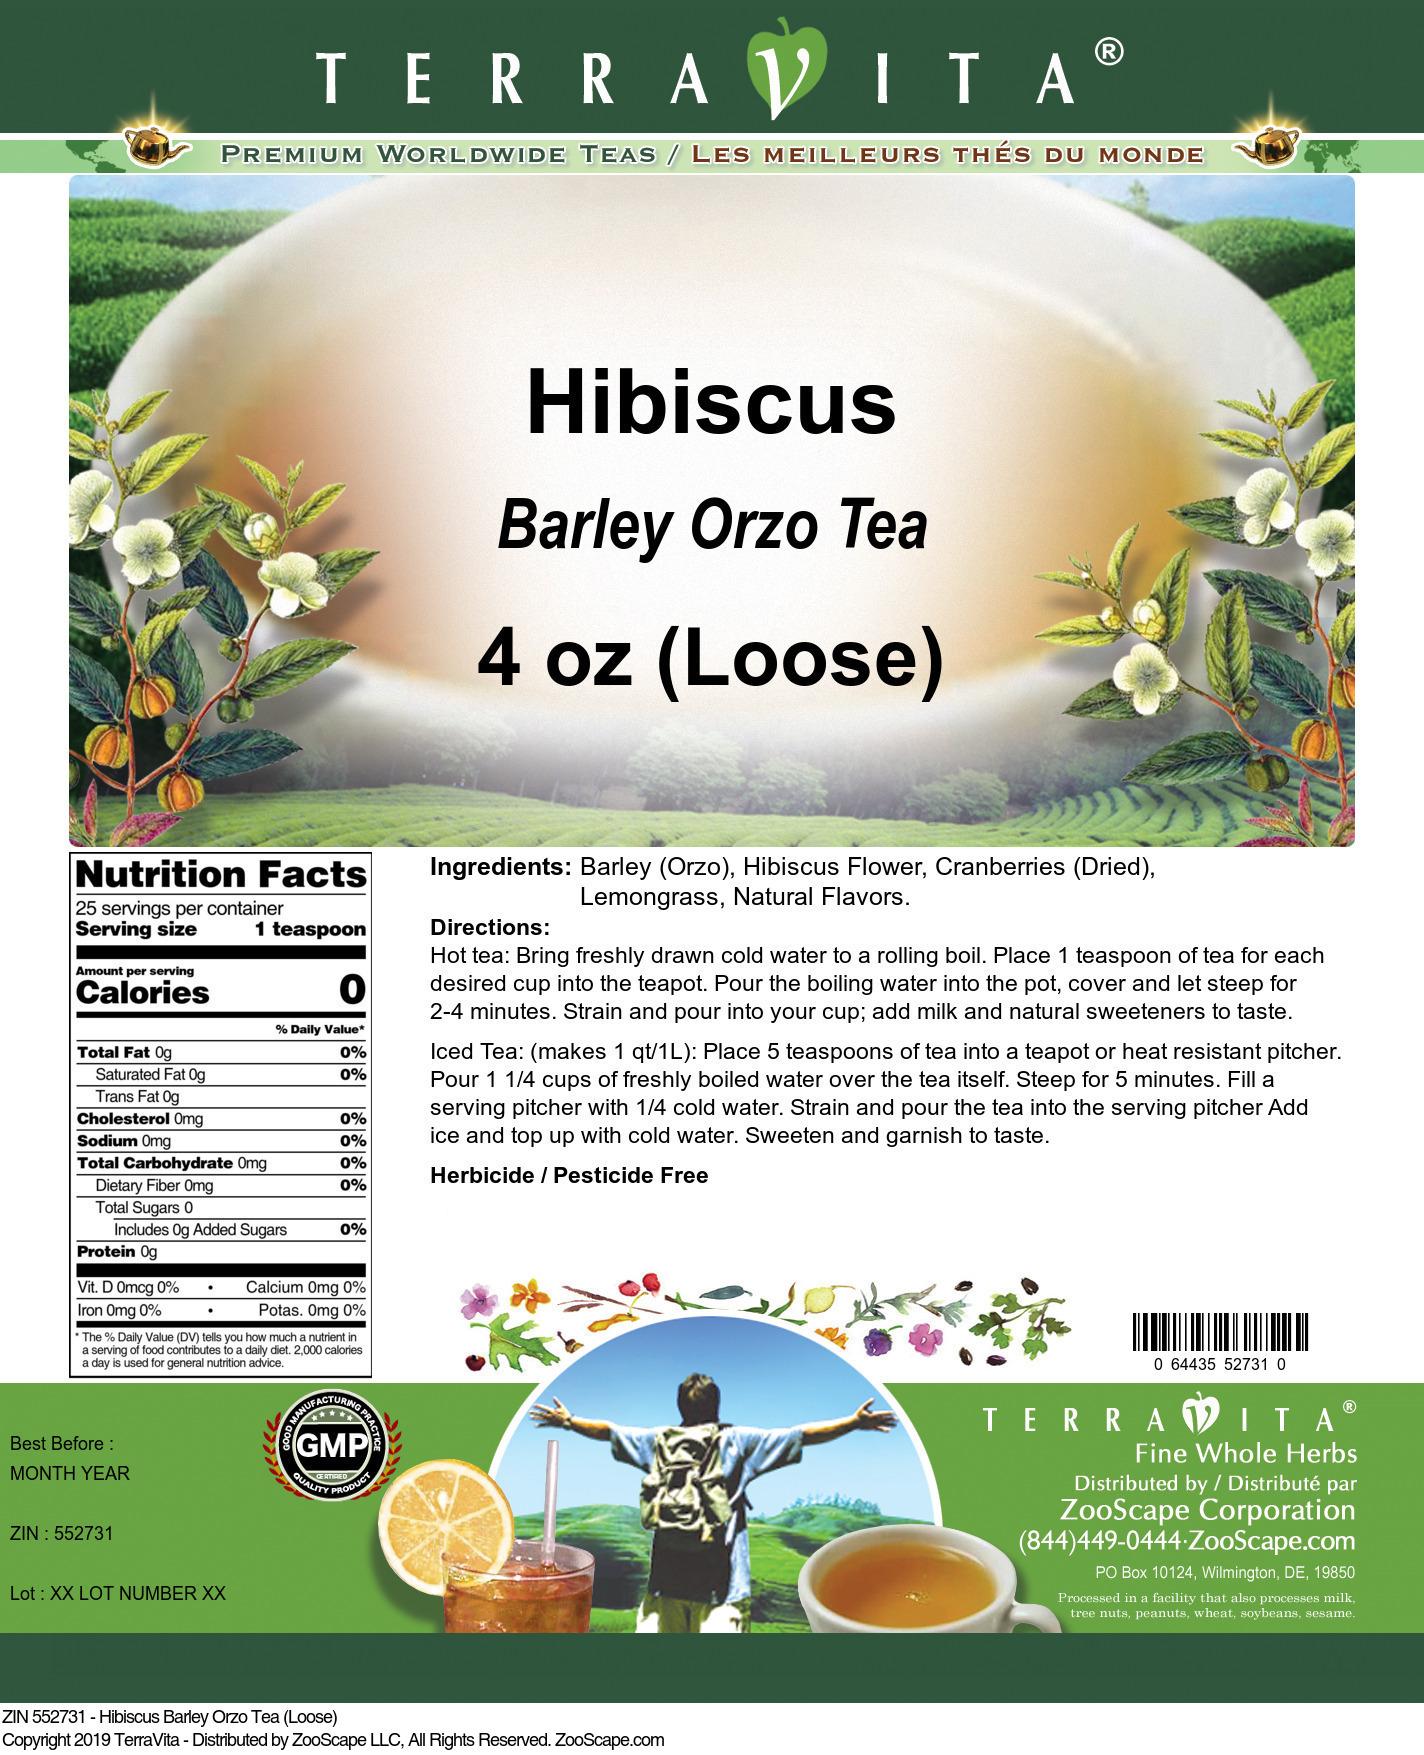 Hibiscus Barley Orzo Tea (Loose)